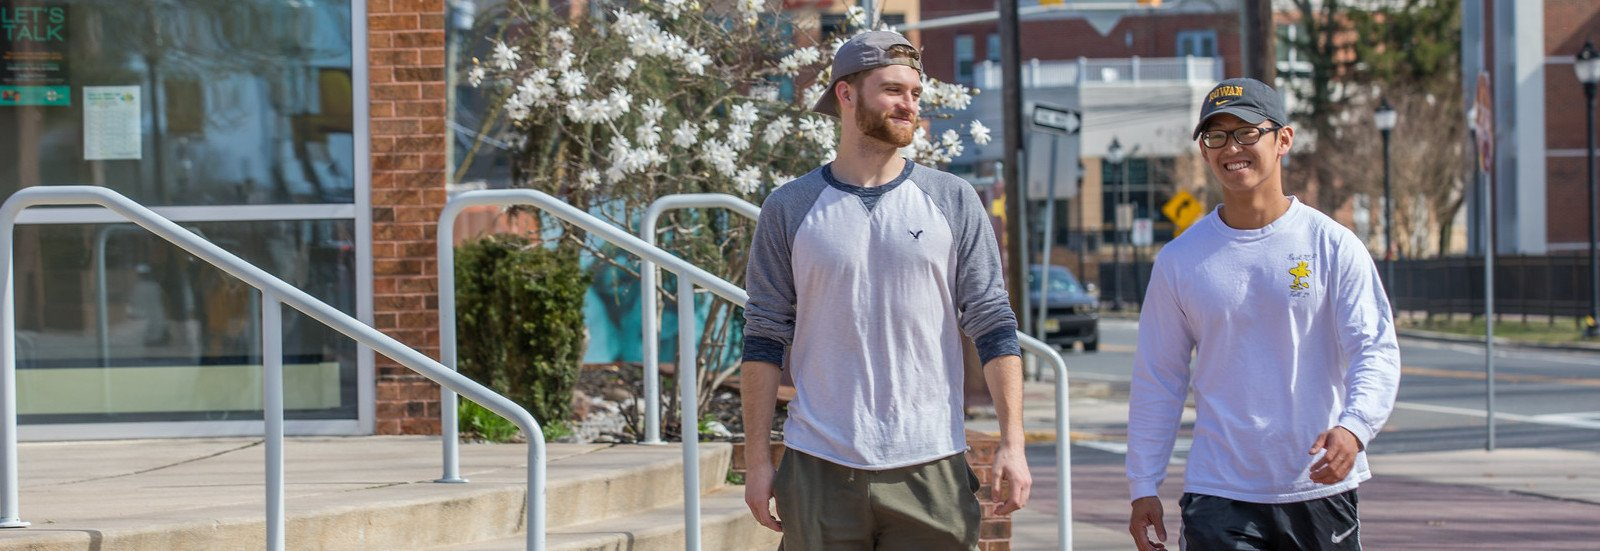 Chris Finnegan and friend walk down campus